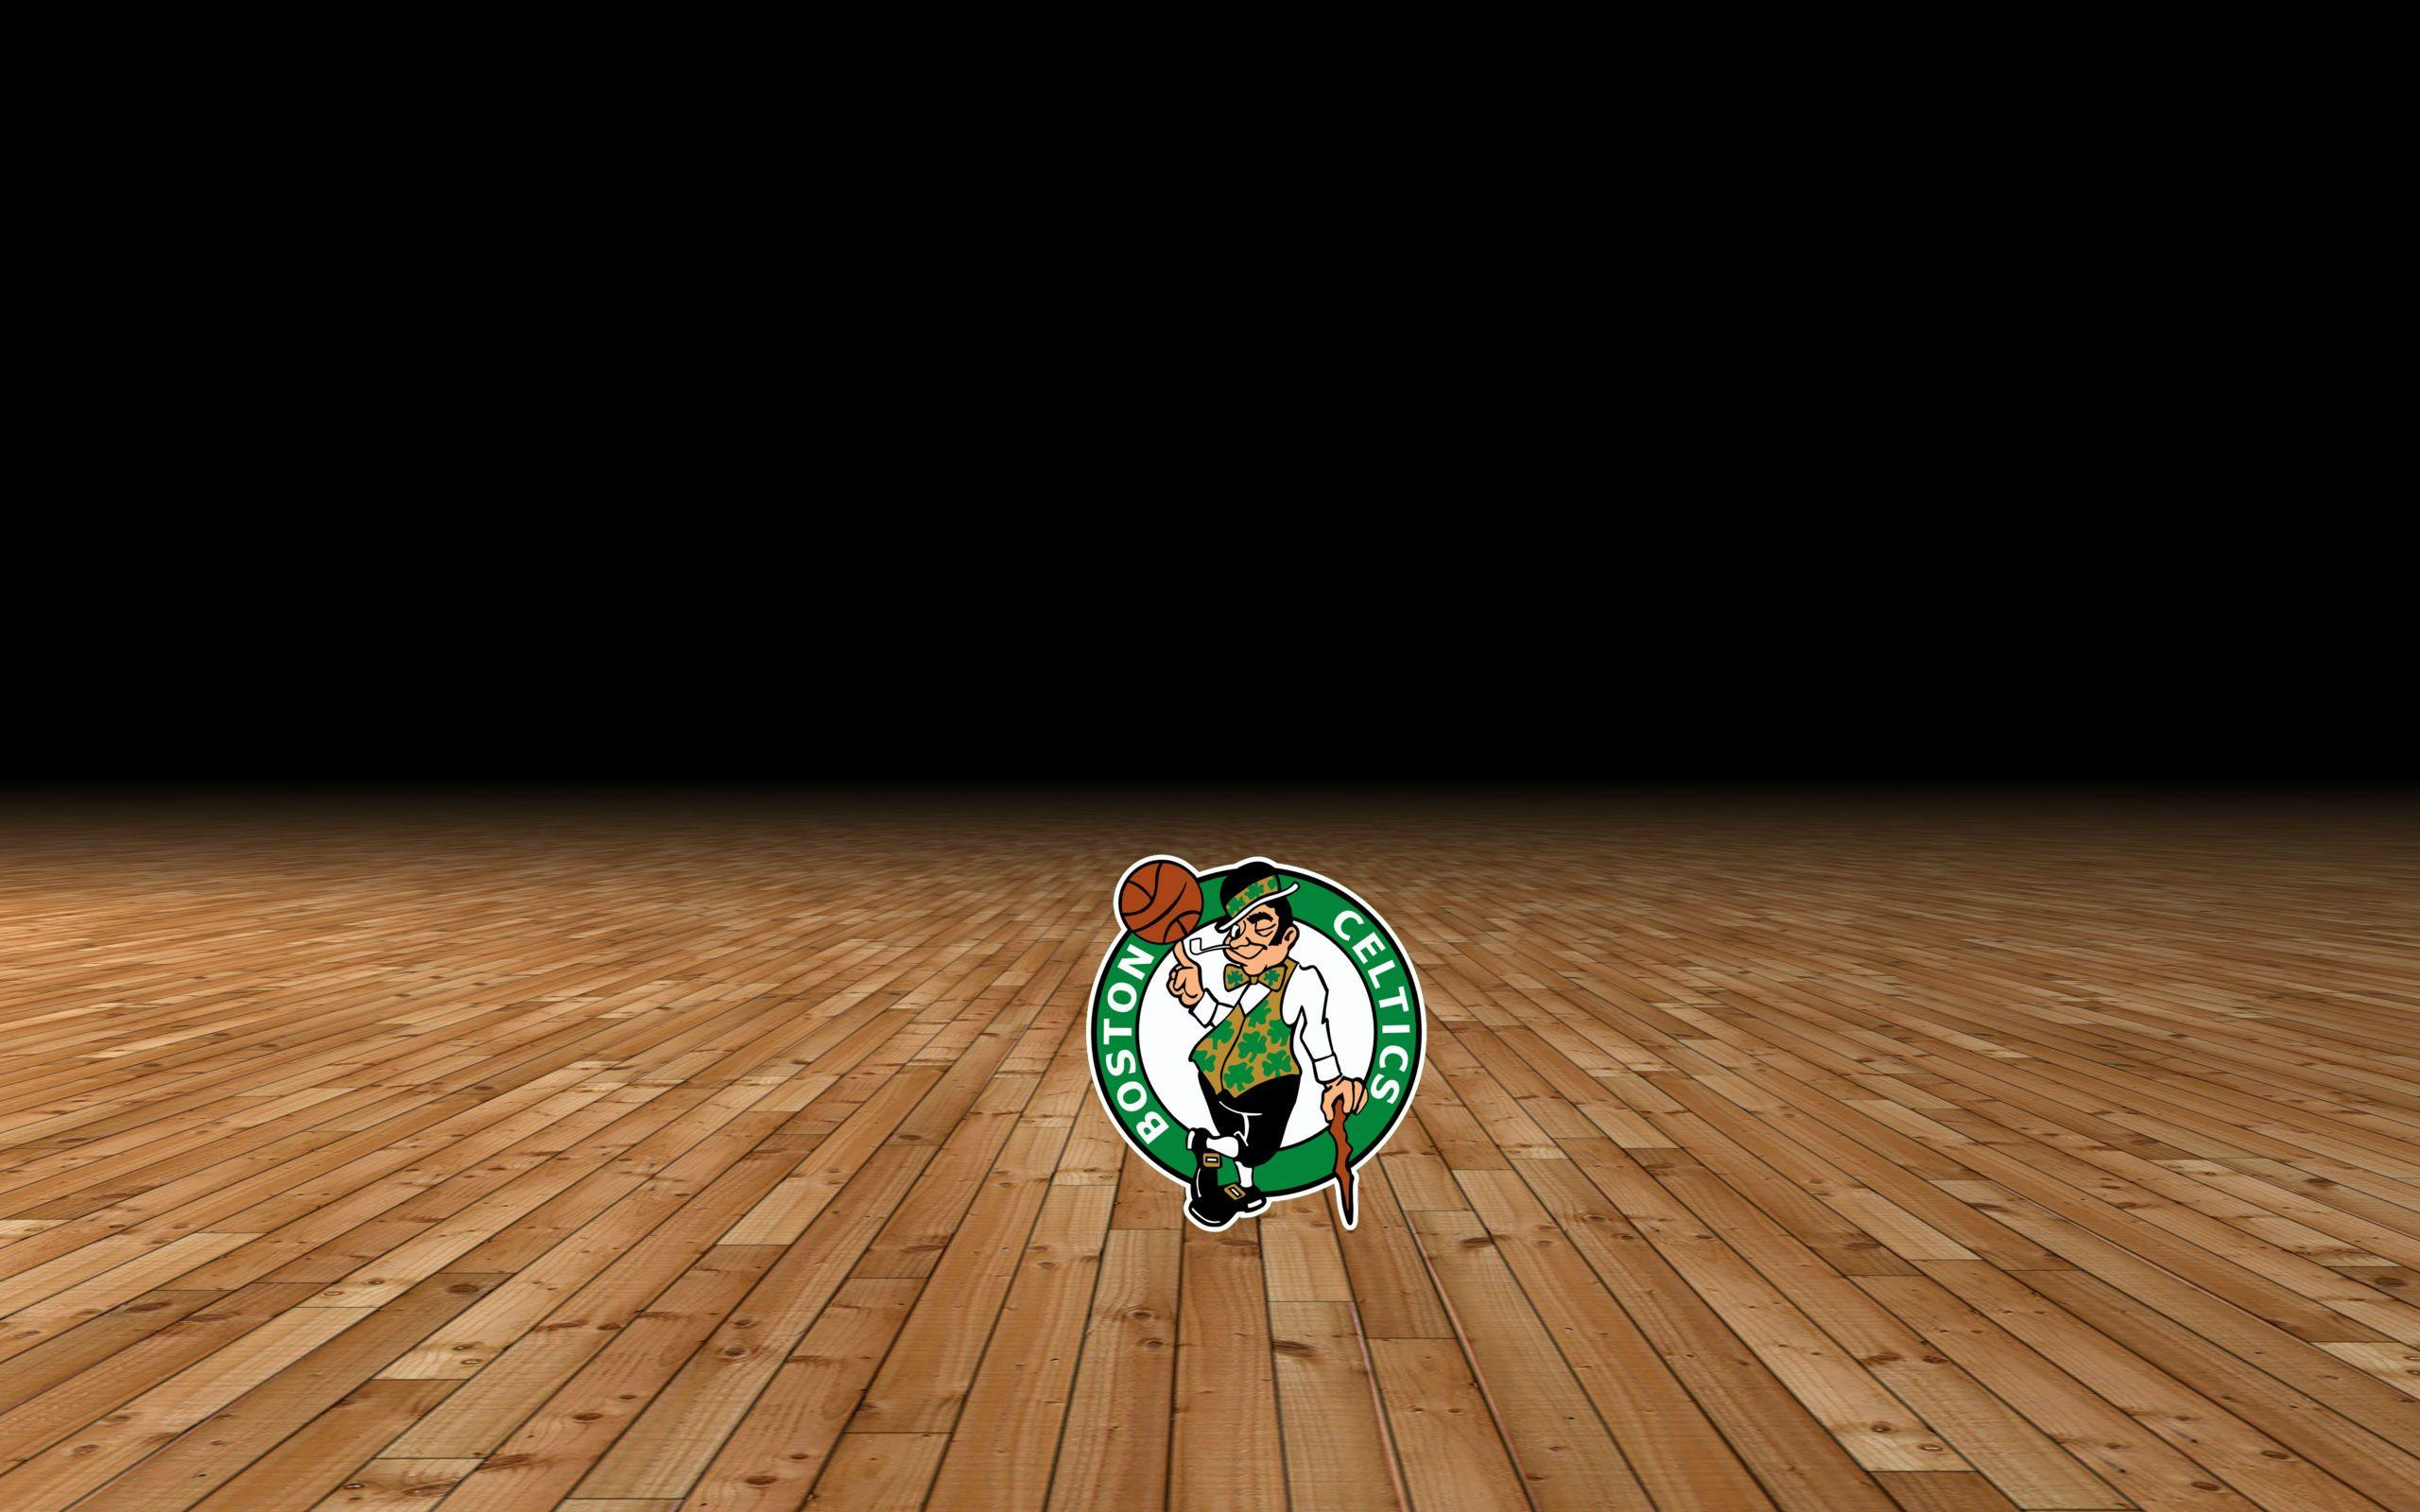 Boston Celtics Wallpapers - Wallpaper Cave